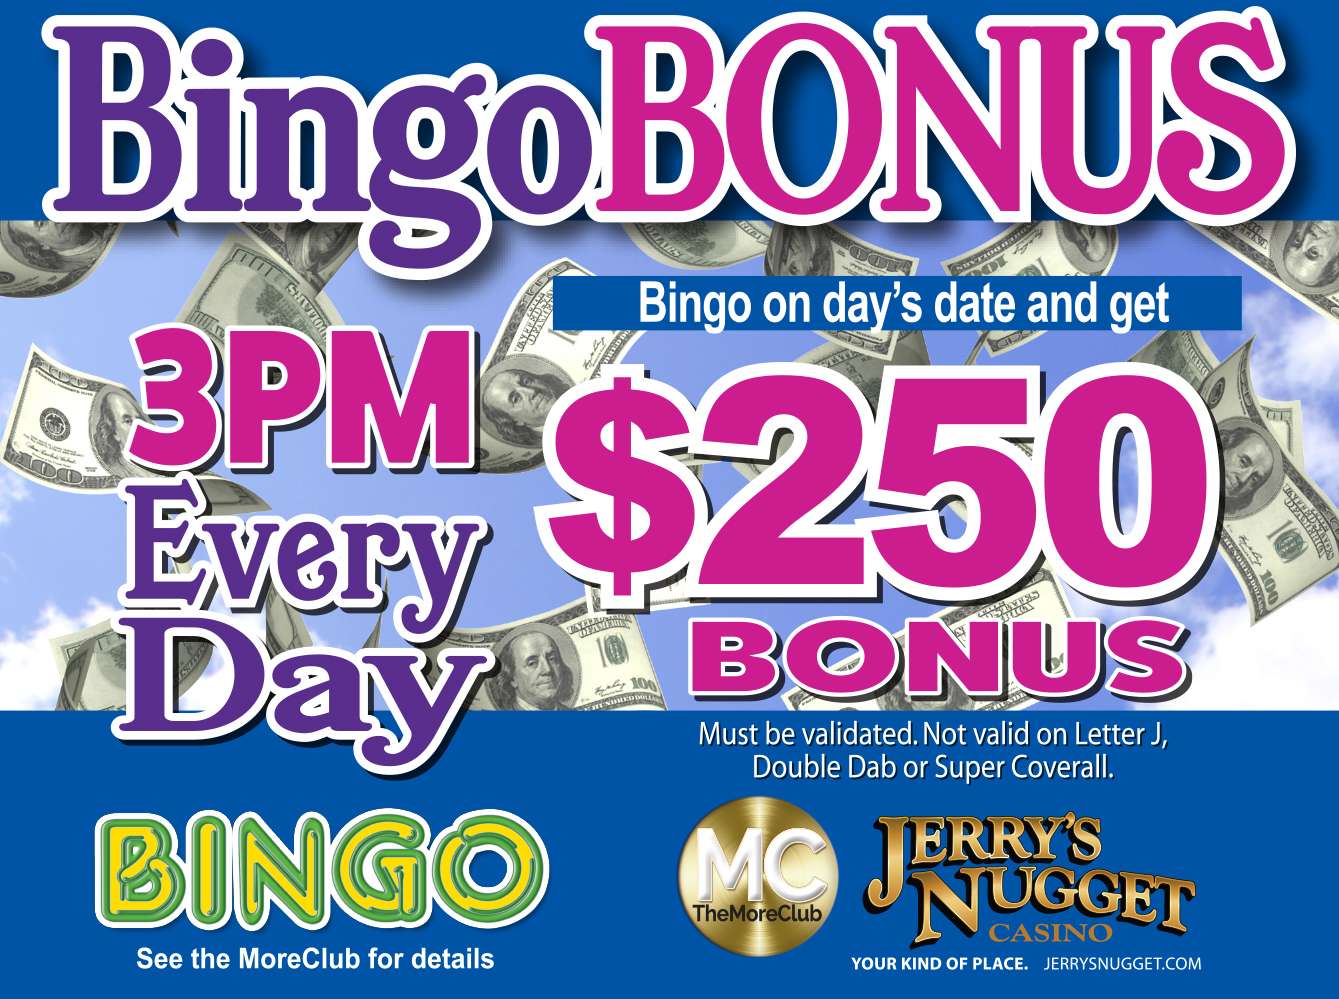 $250 Bingo Bonus Every Day